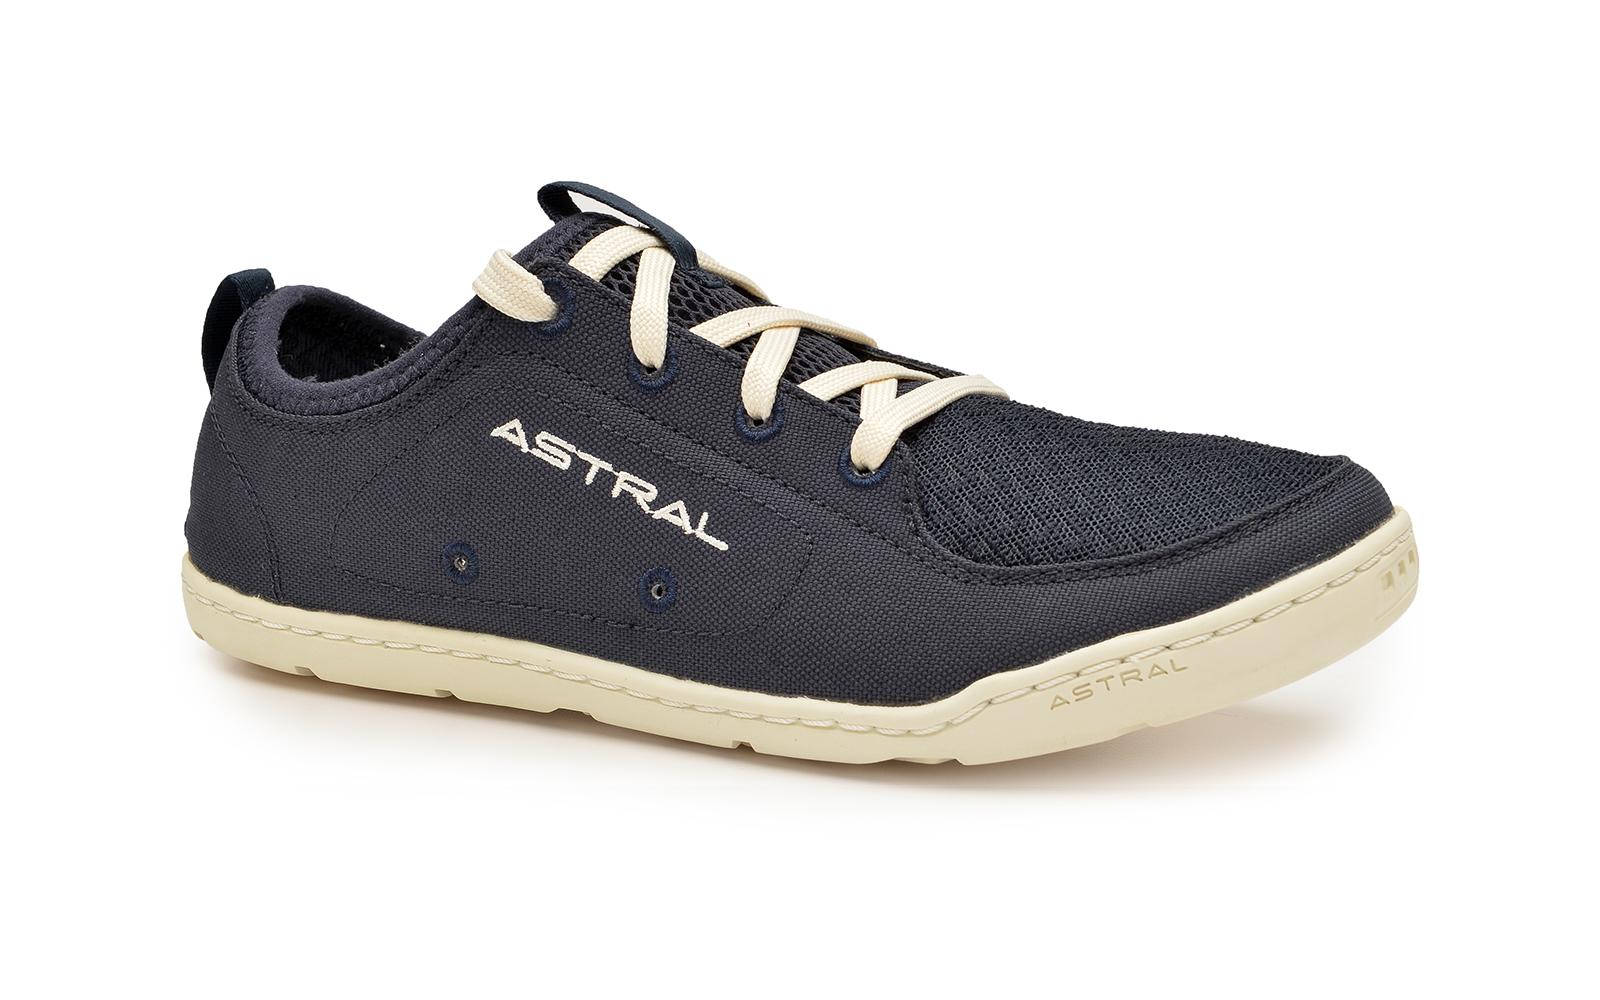 ASTRAL_Loyak_Ws_Navy_White_34_web